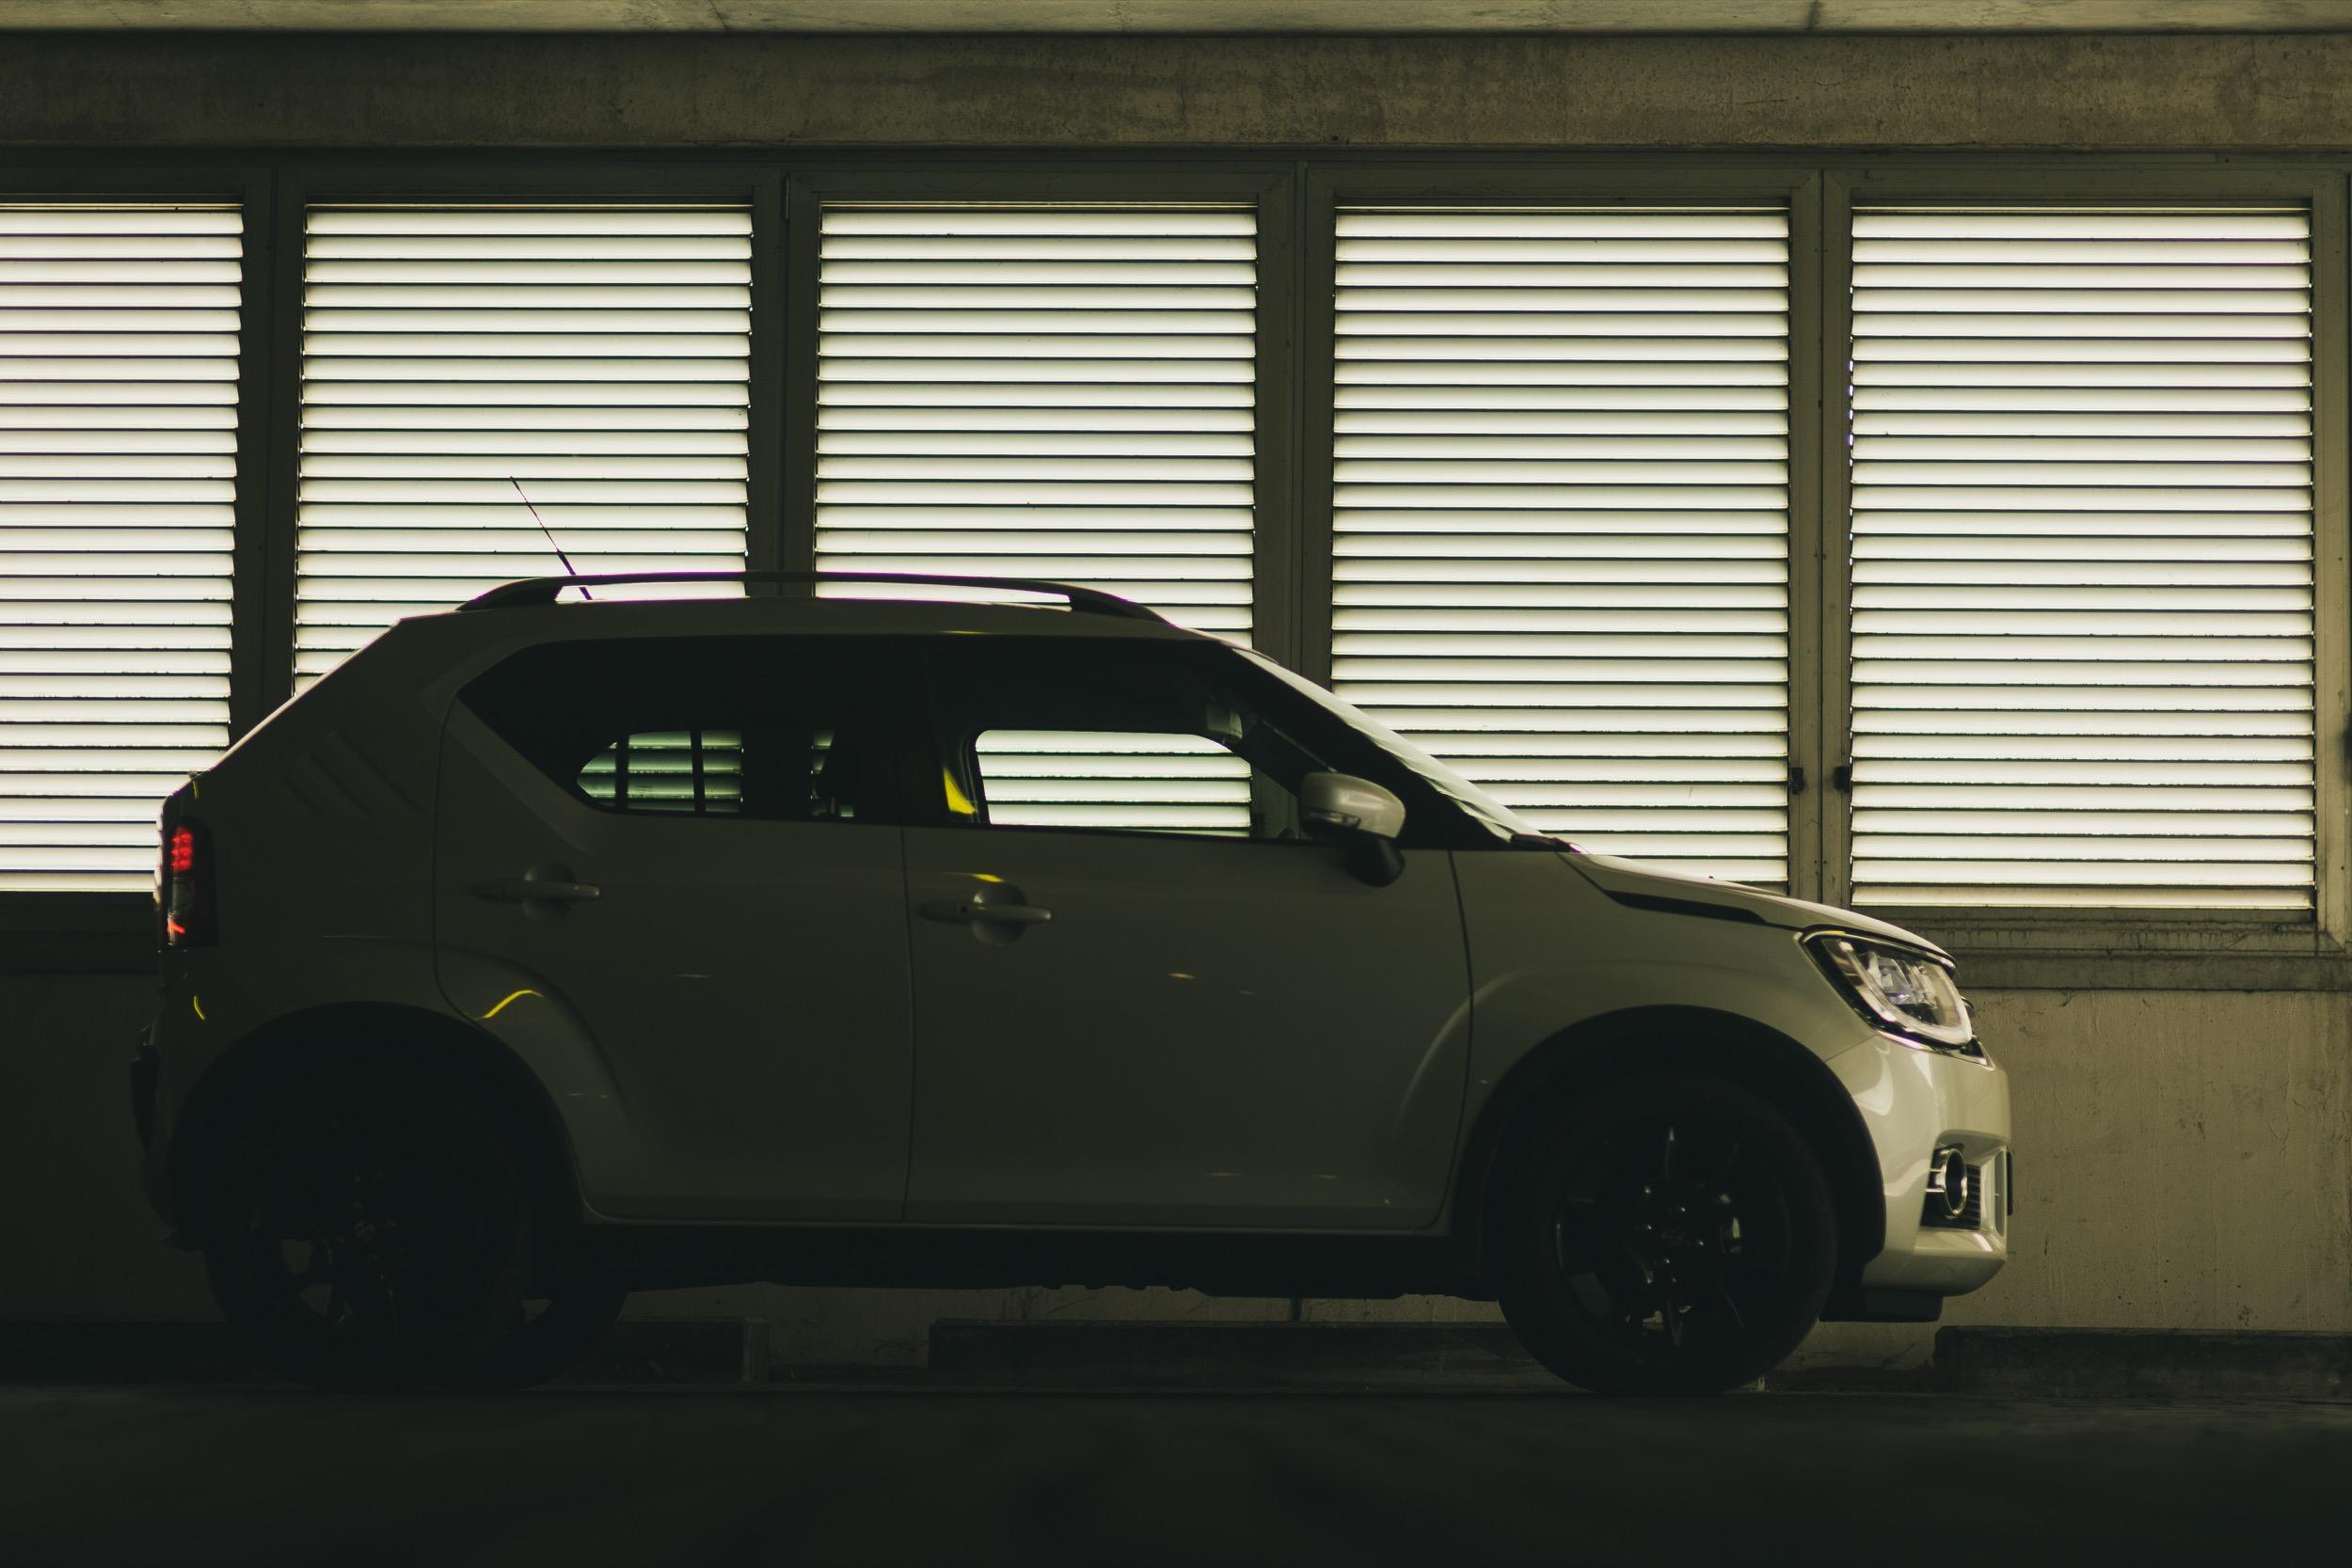 suzuki, ignis, lifestyle, automotive, photographer, suzuki ignis